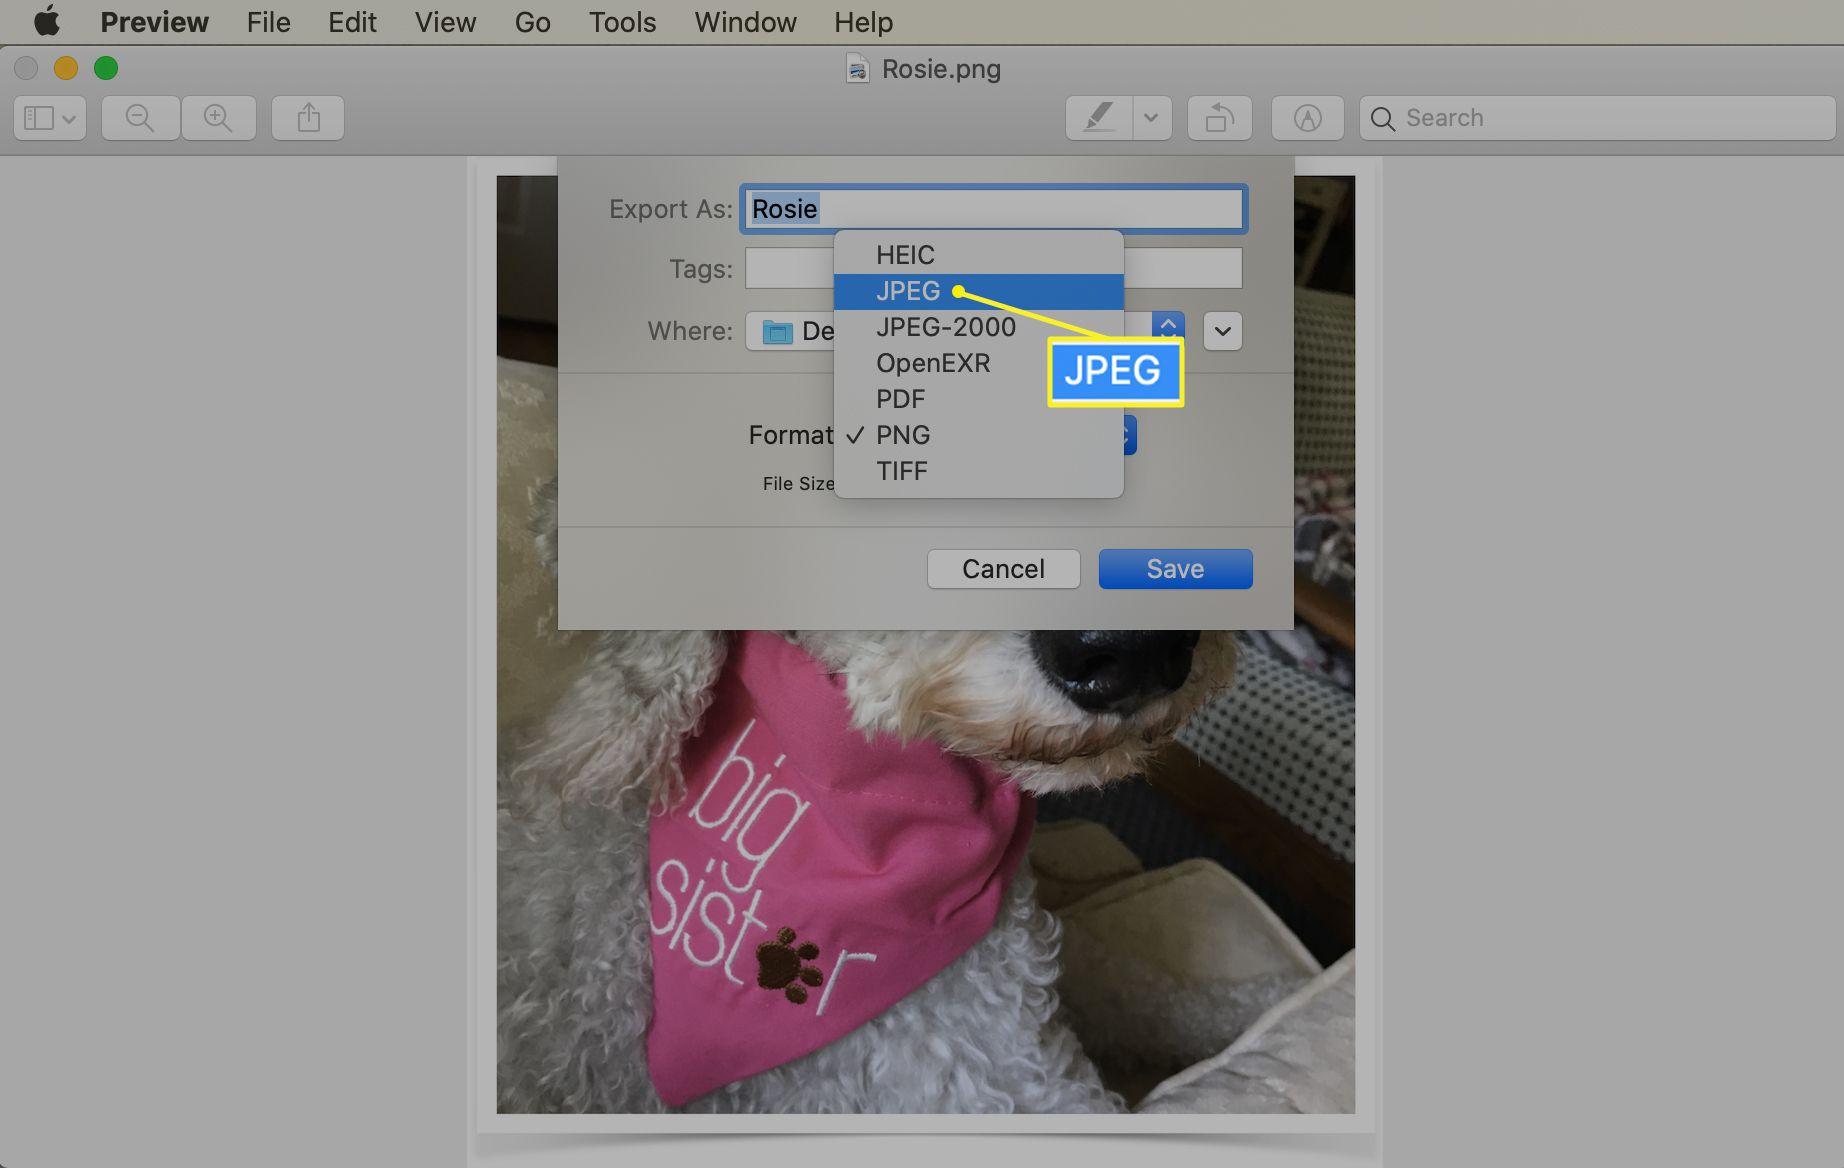 JPEG selected in the Preview Format menu